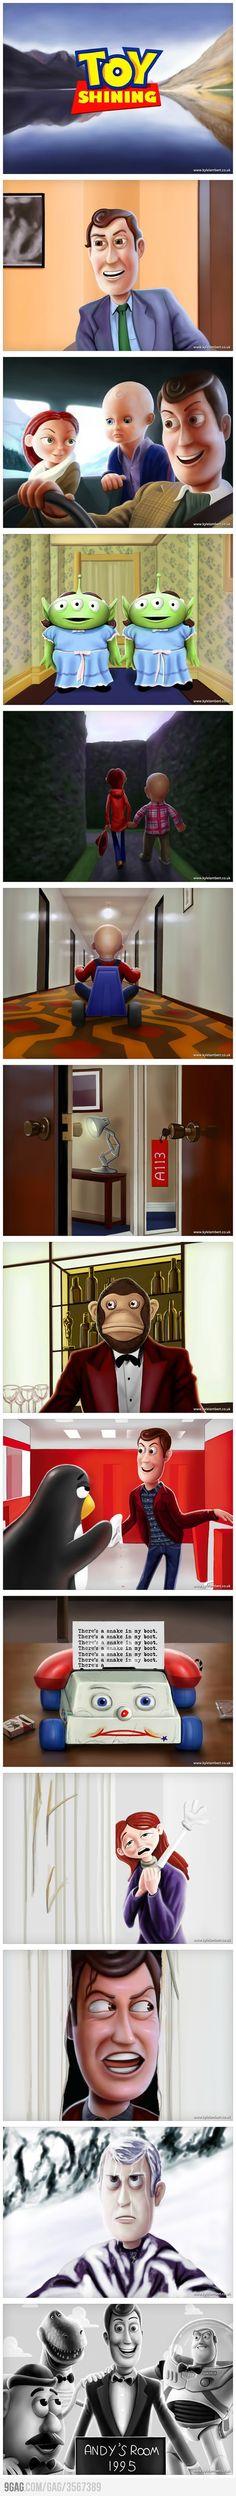 Toy Story X Shining